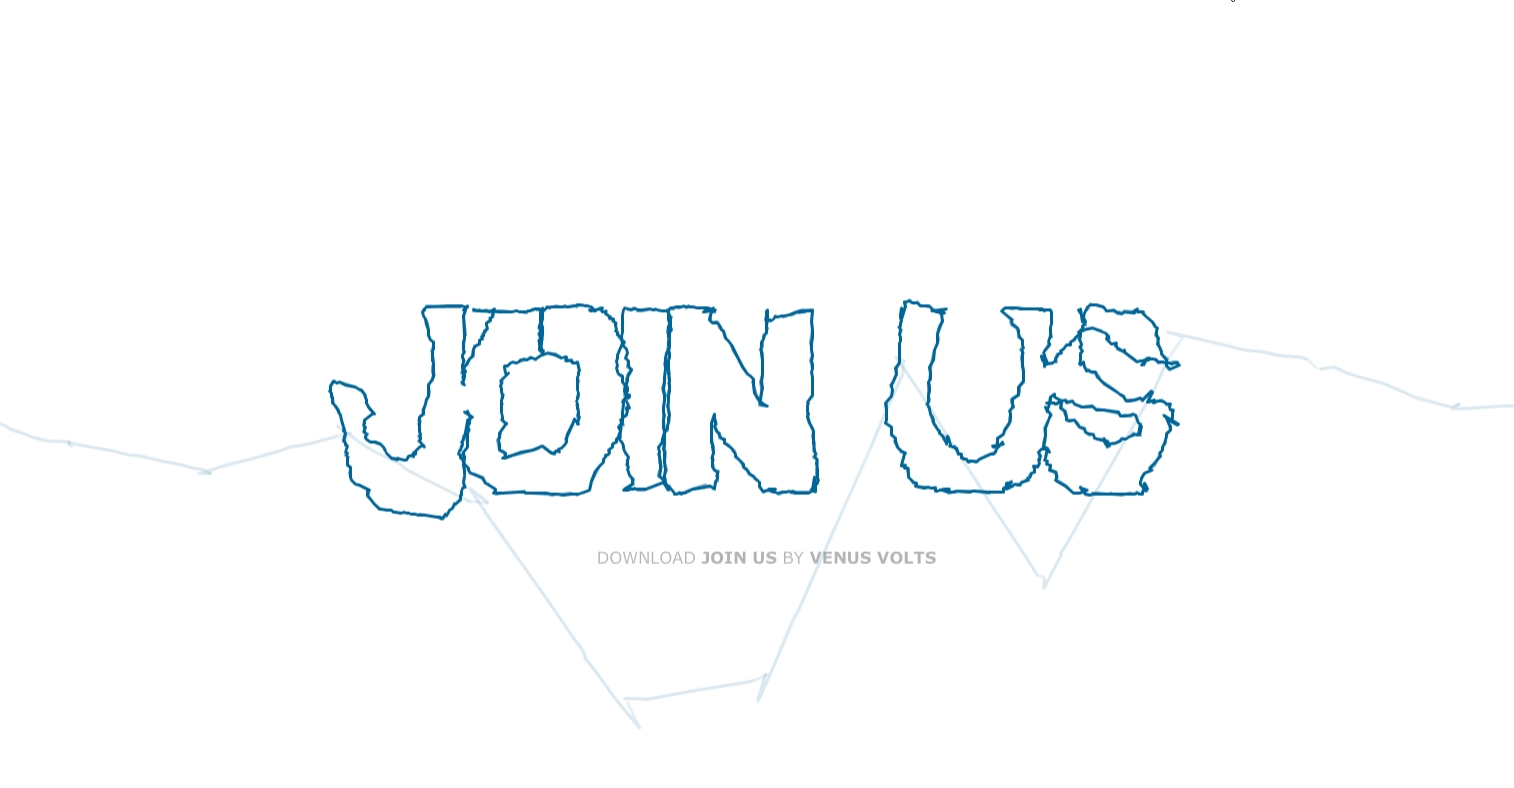 Join Us (Venus Volts)